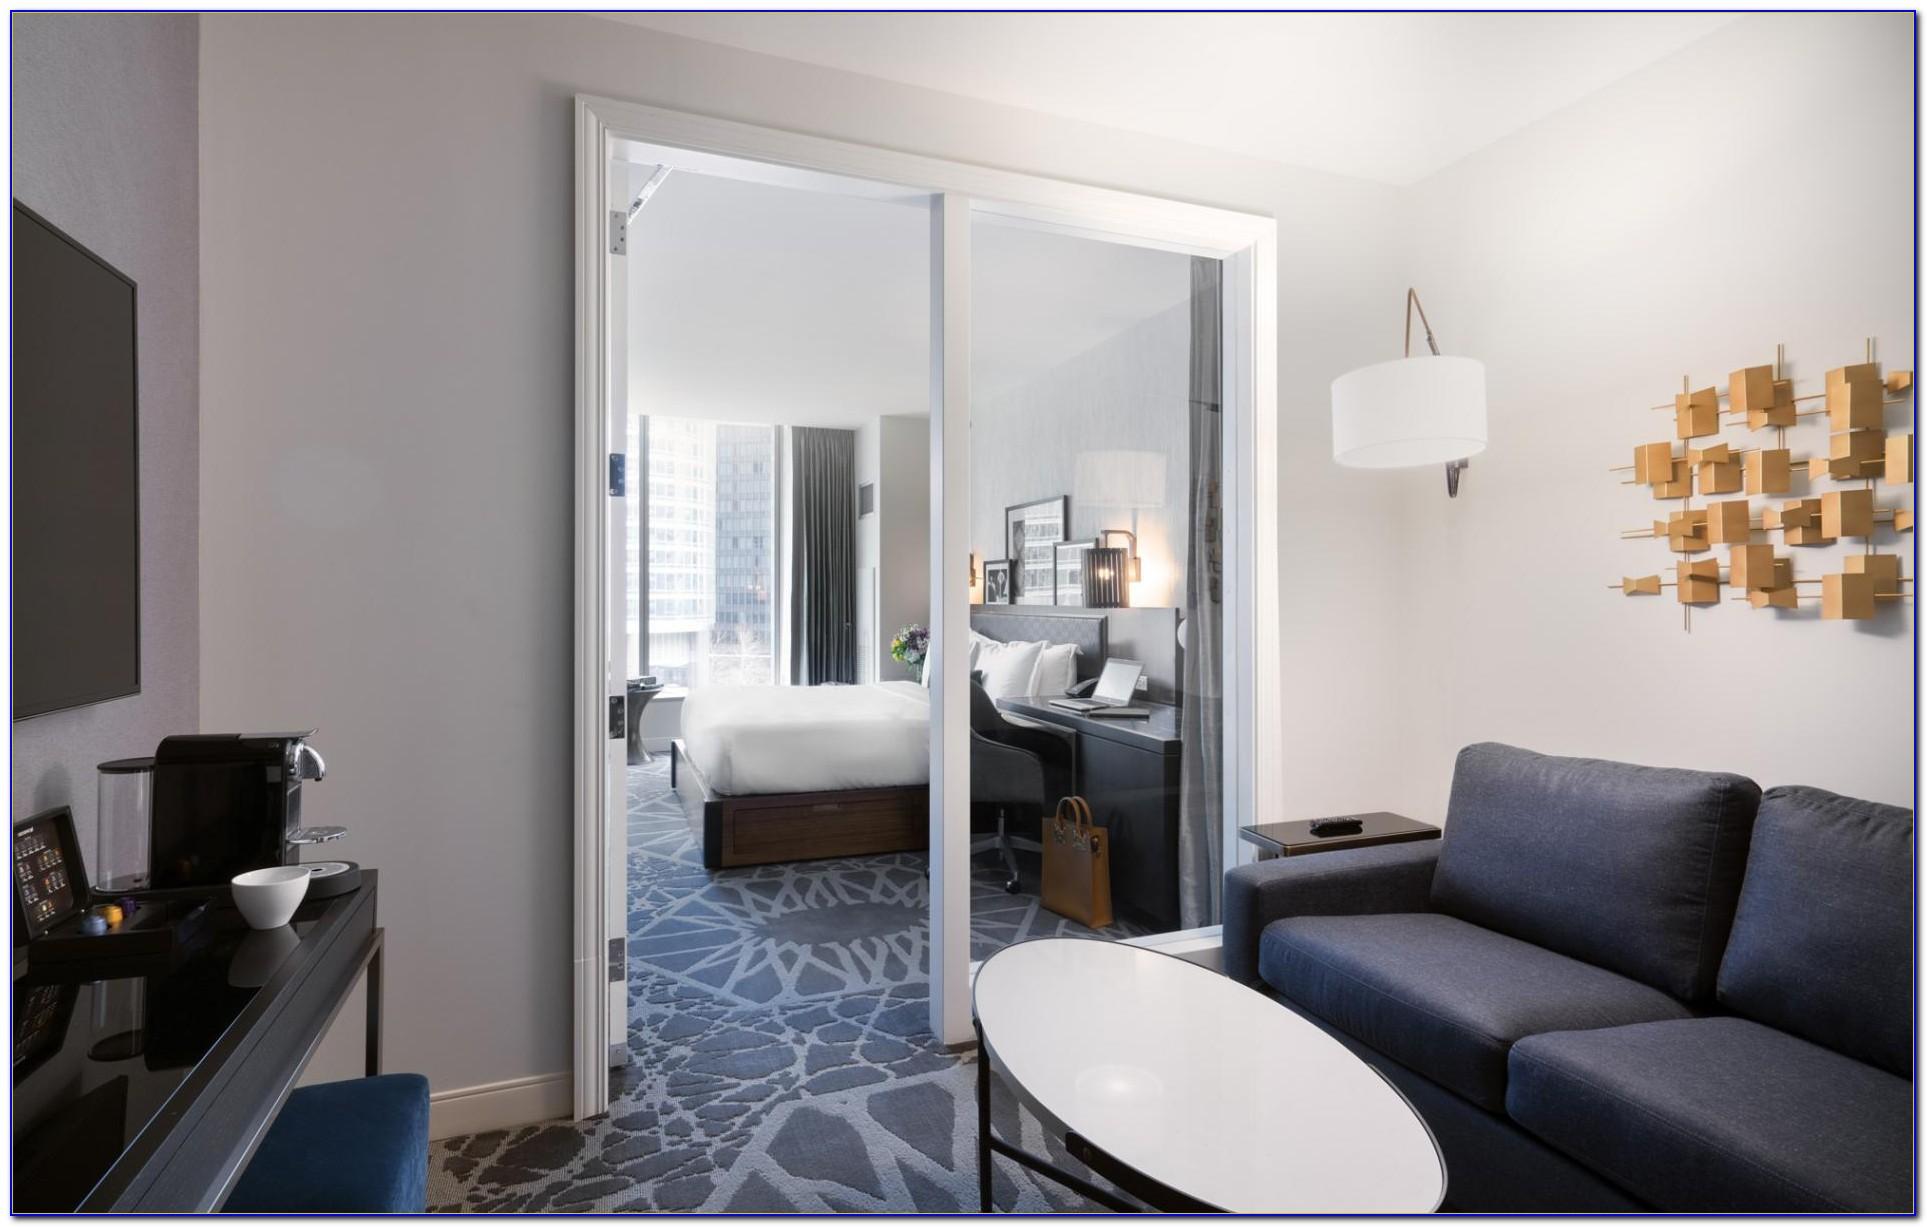 2 Bedroom Suite Chicago Il